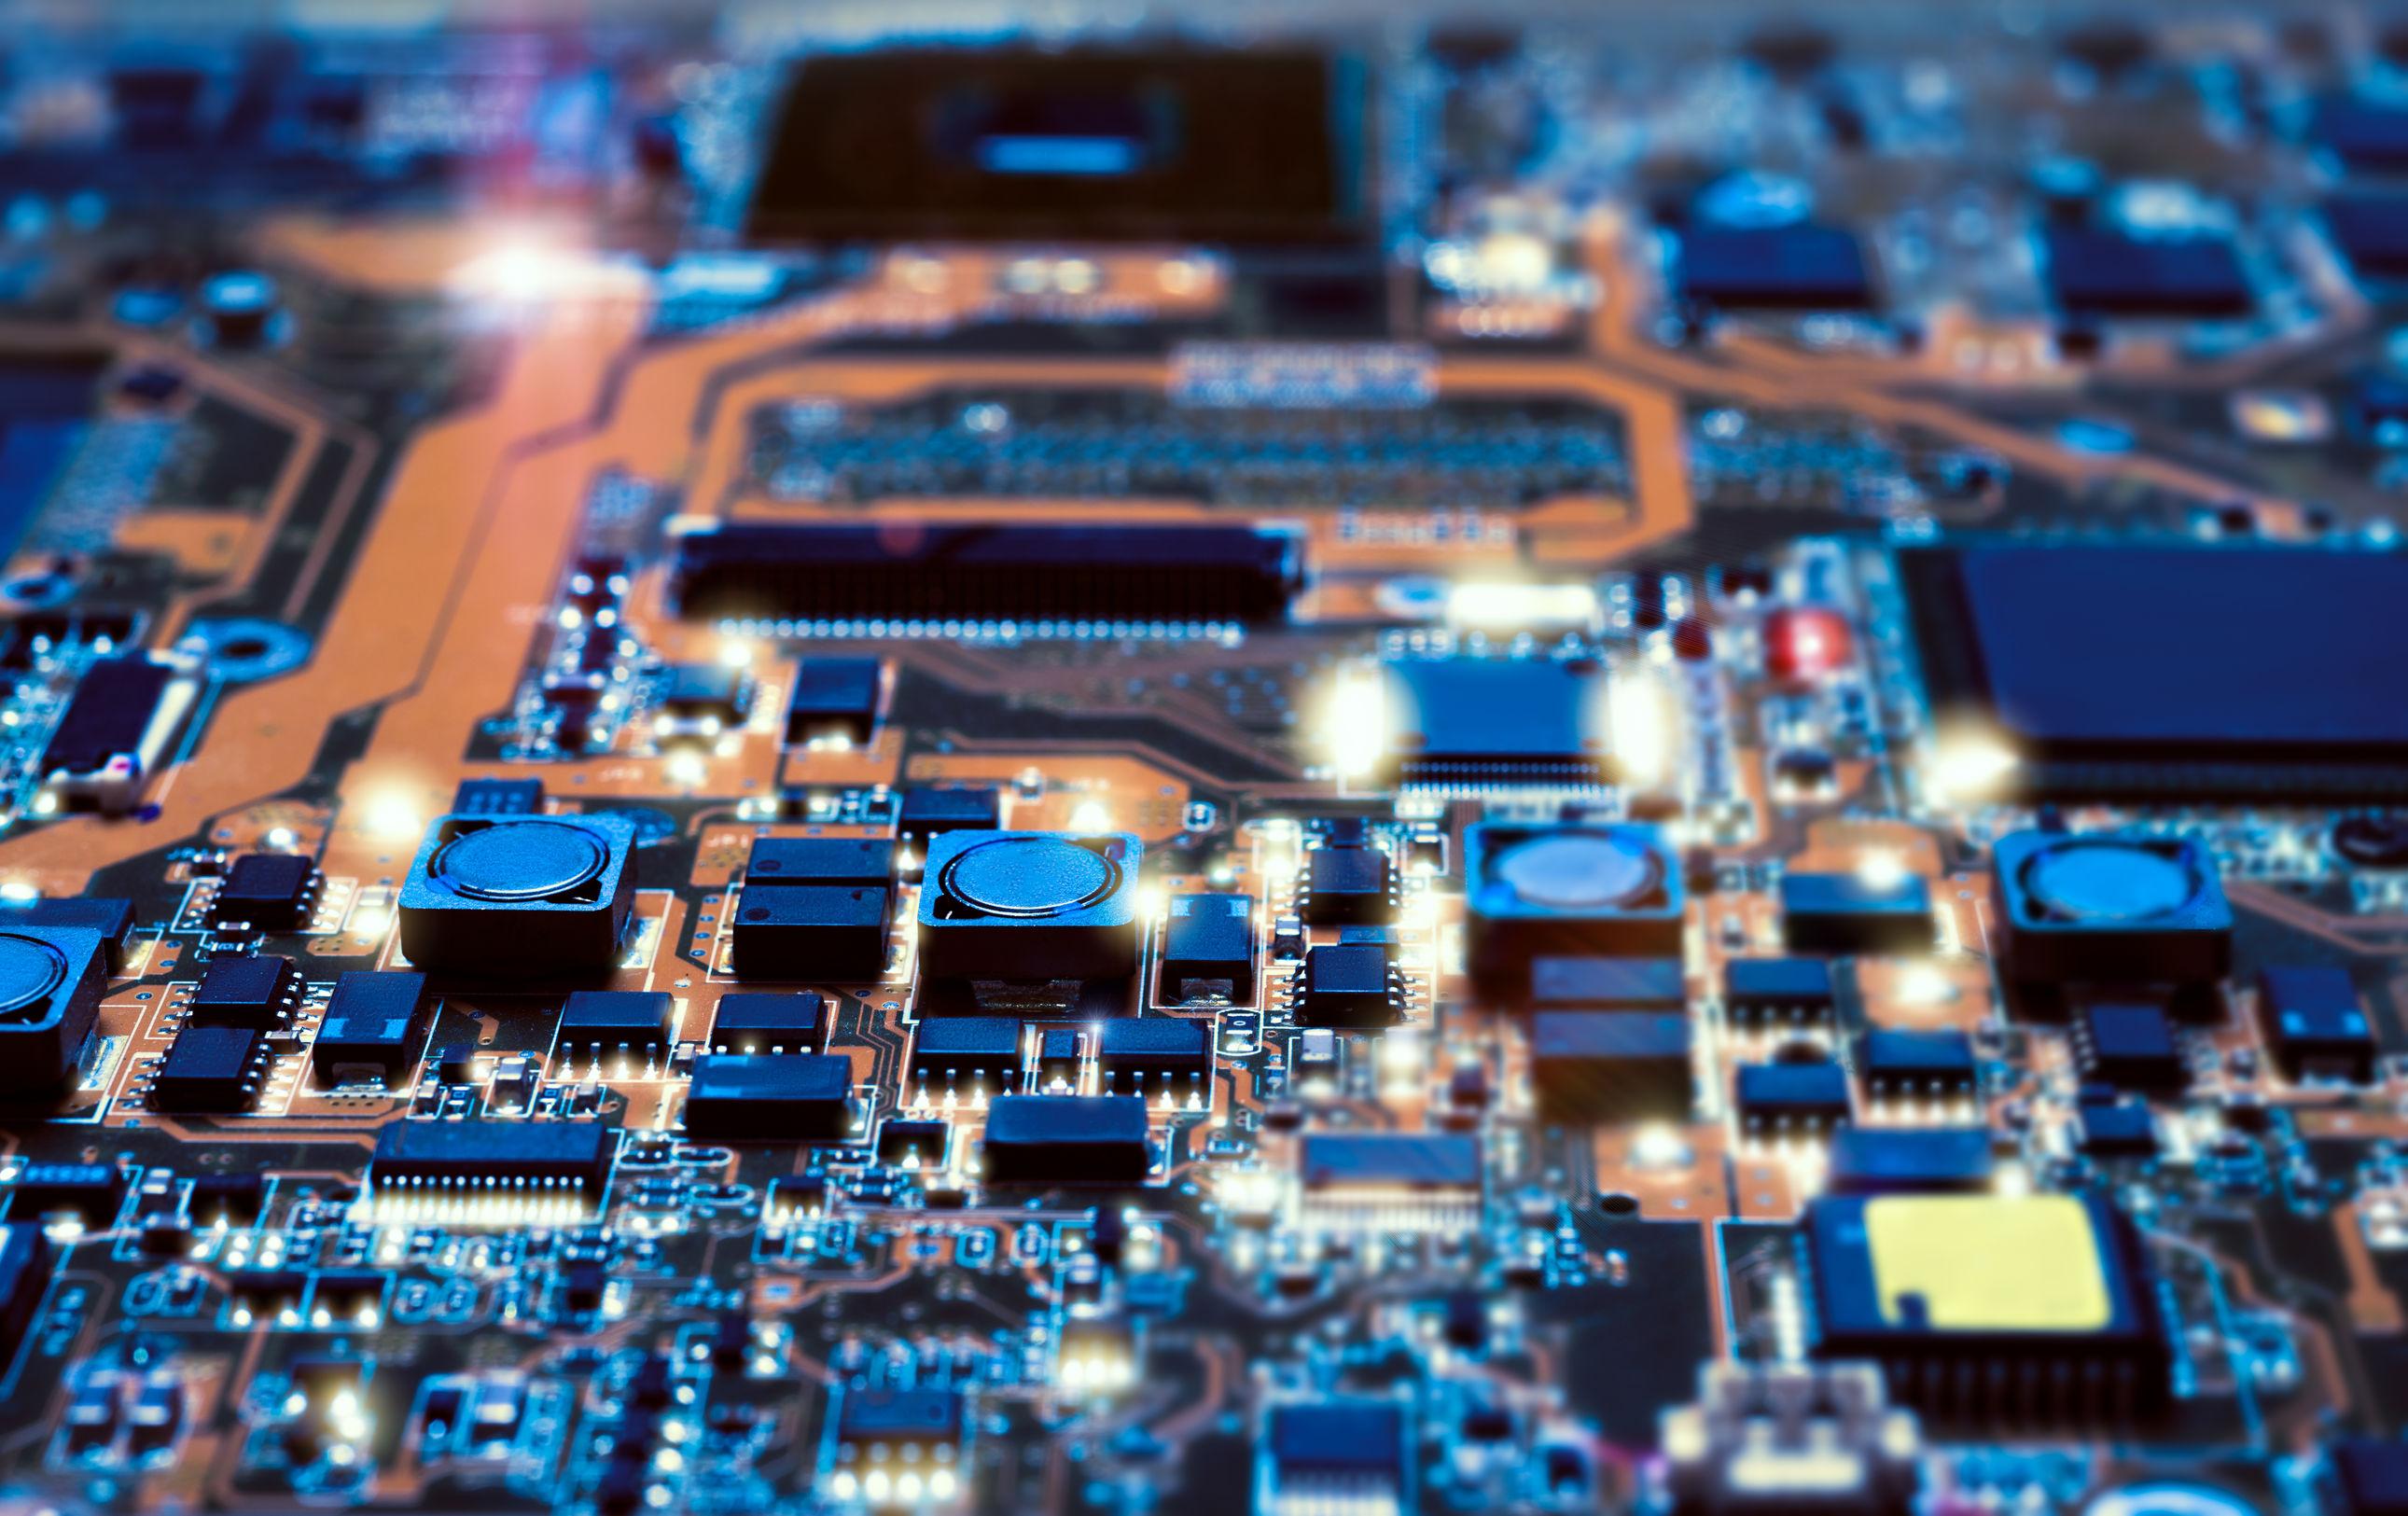 Hardware manufacturers